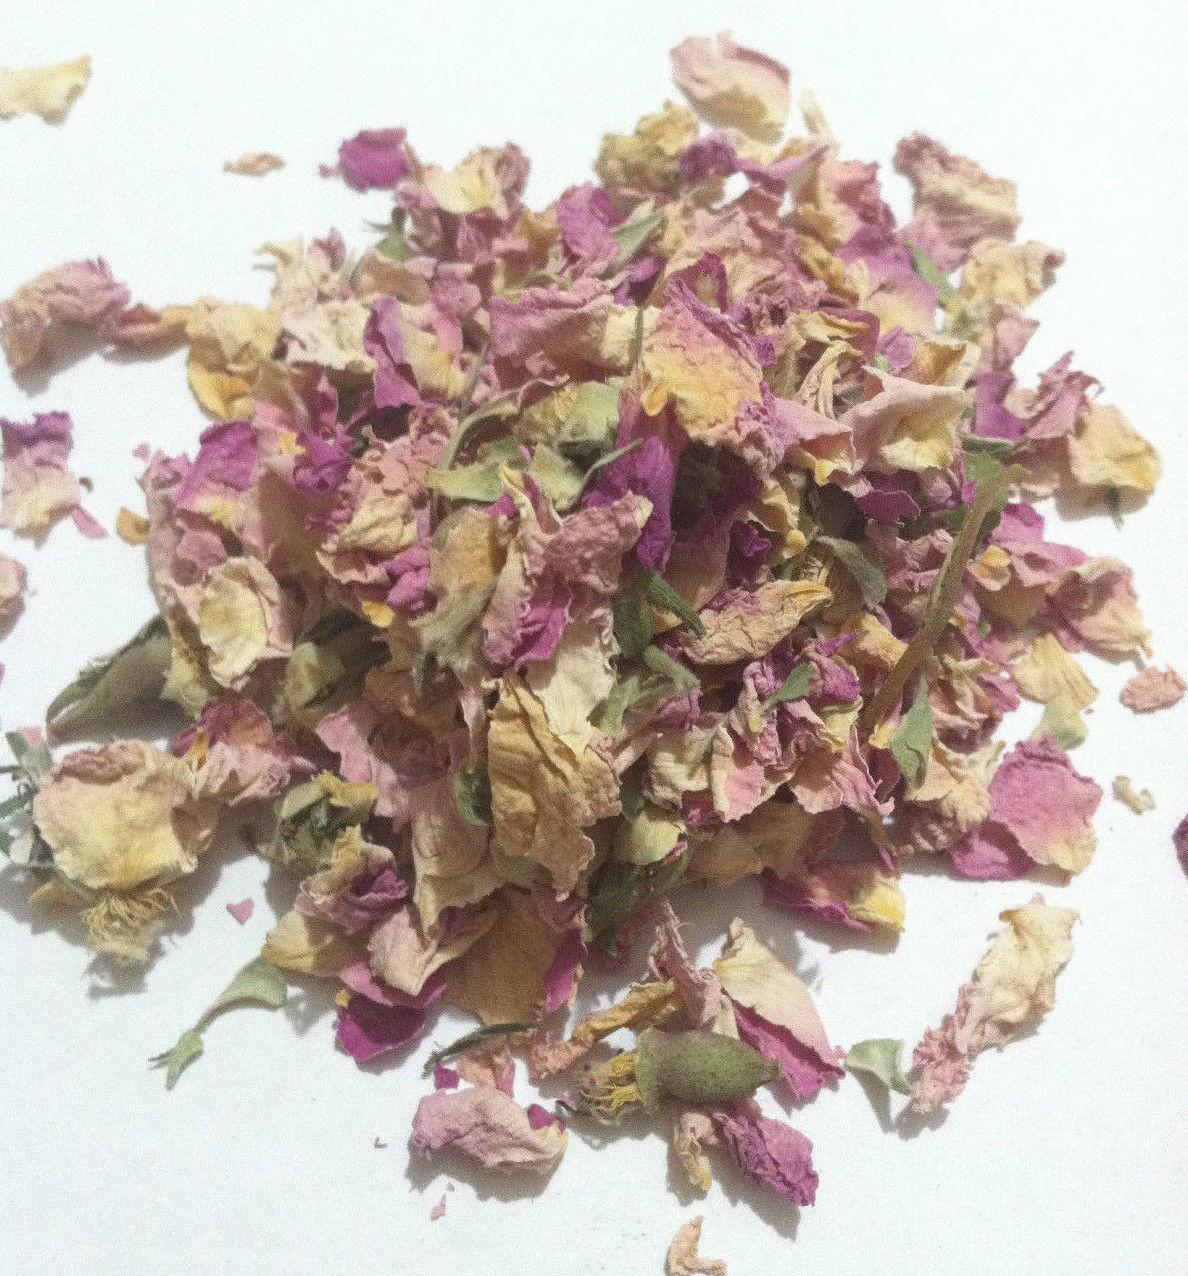 1 oz Roses Pink (Rosa sp.) Organic & Kosher Morocco – Our Sacred Garden